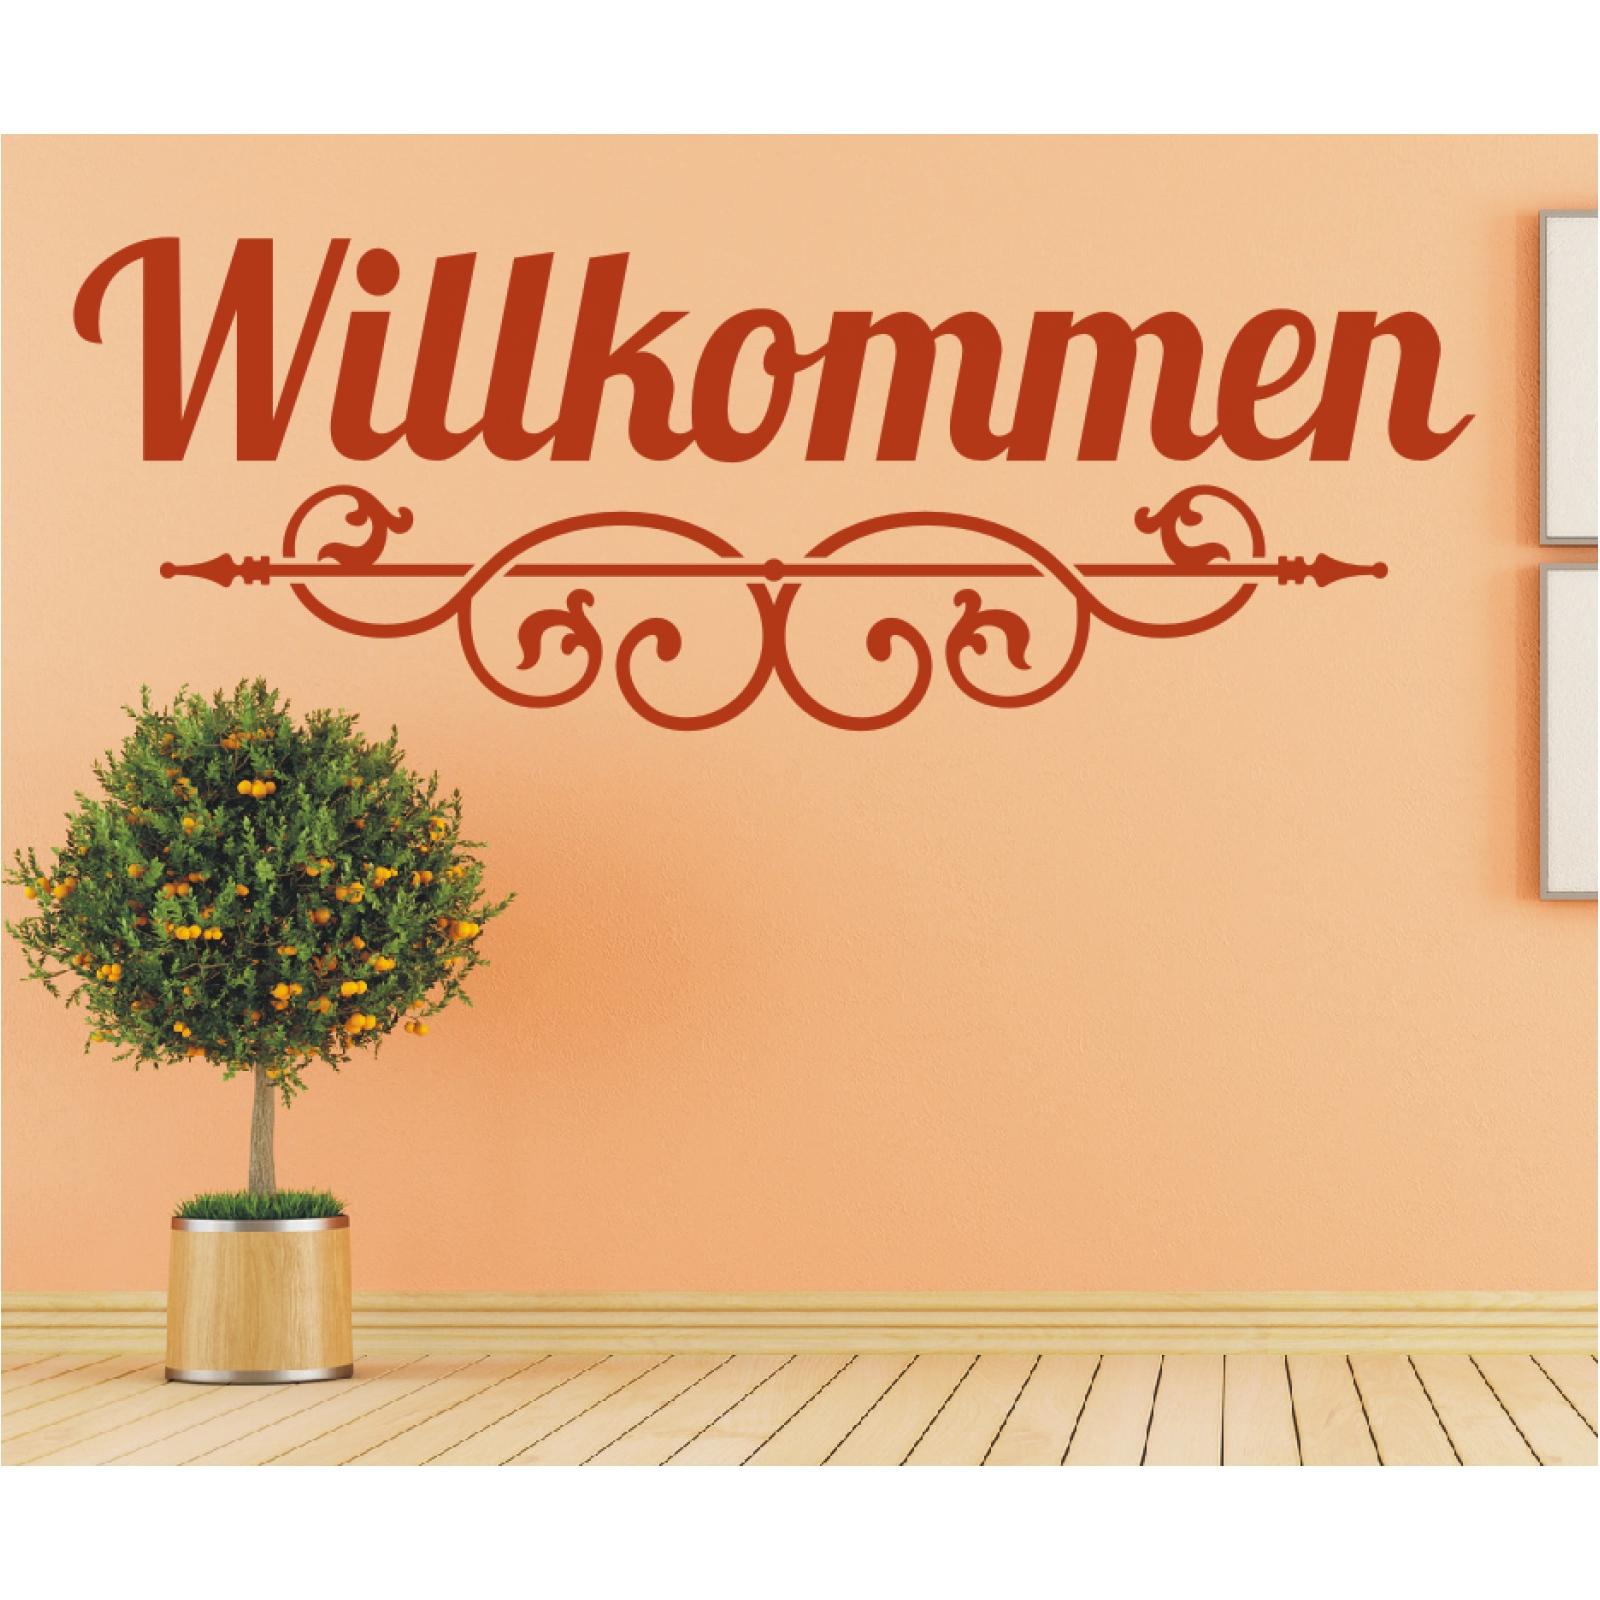 Wandtattoo Spruch Willkommen Flur Ornament Sticker Wandaufkleber Wandsticker